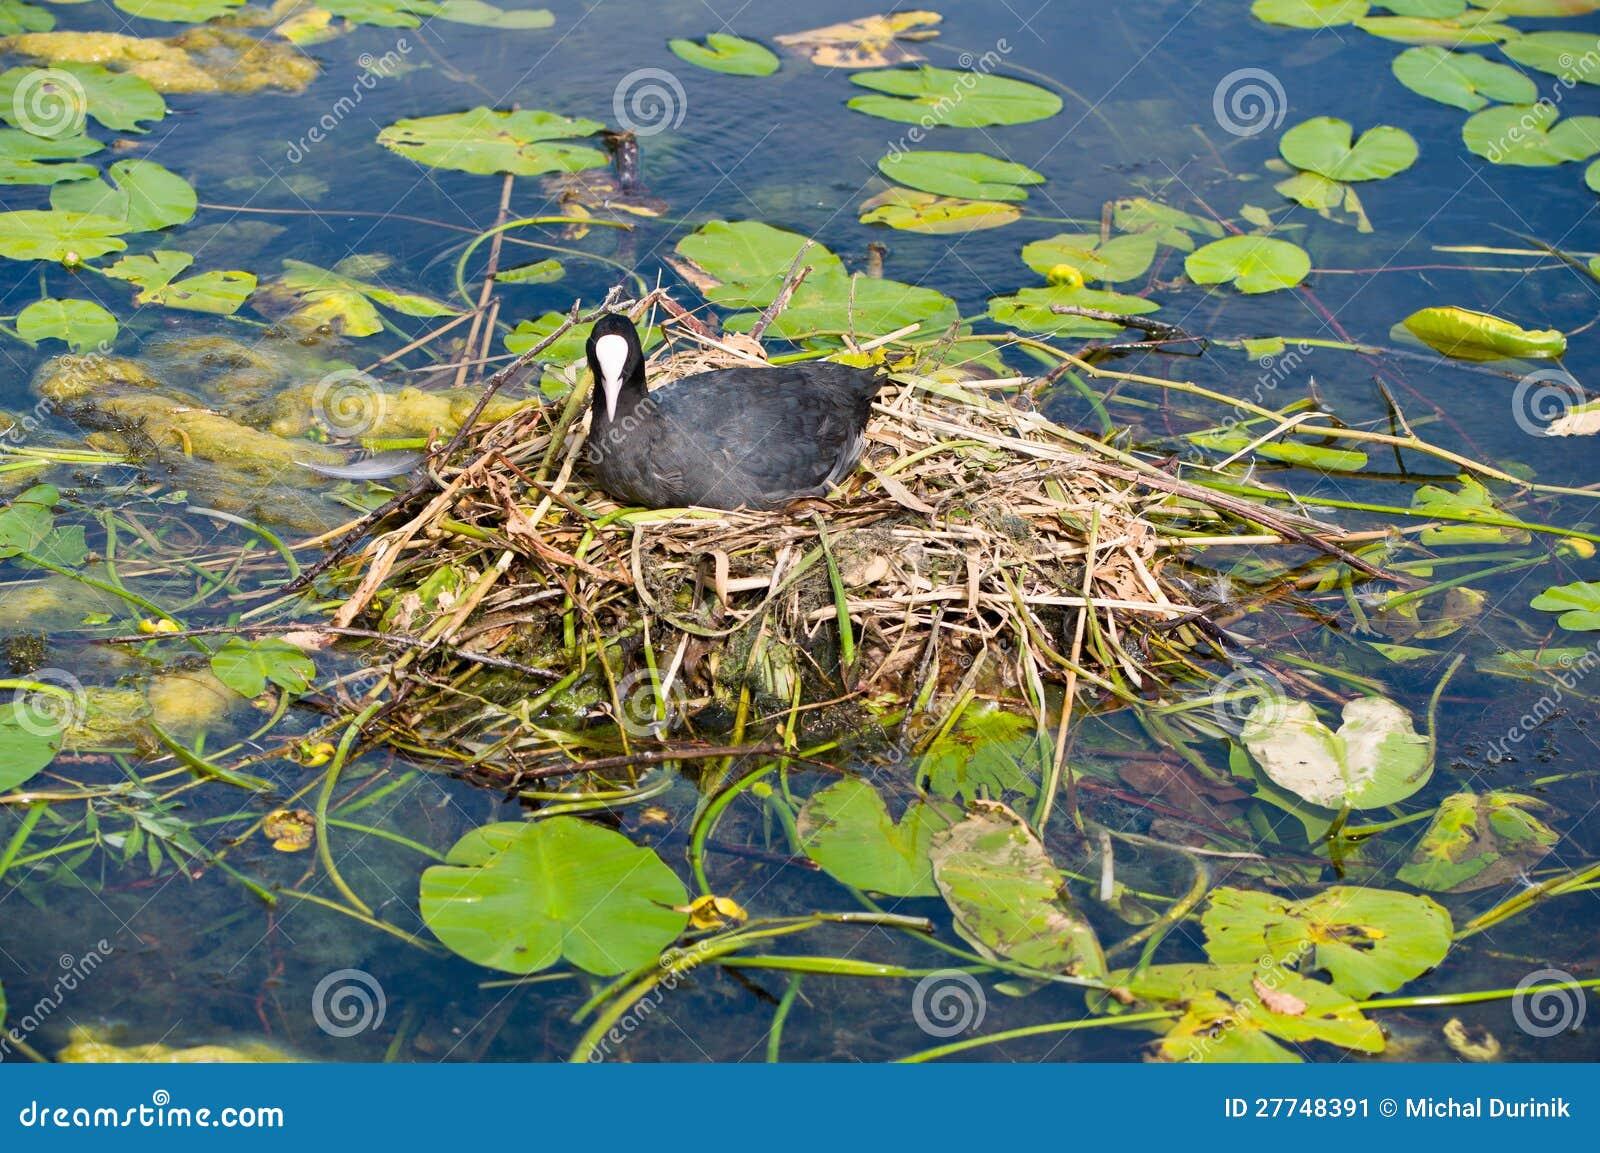 Water bird nesting stock image. Image of morning, natural ...